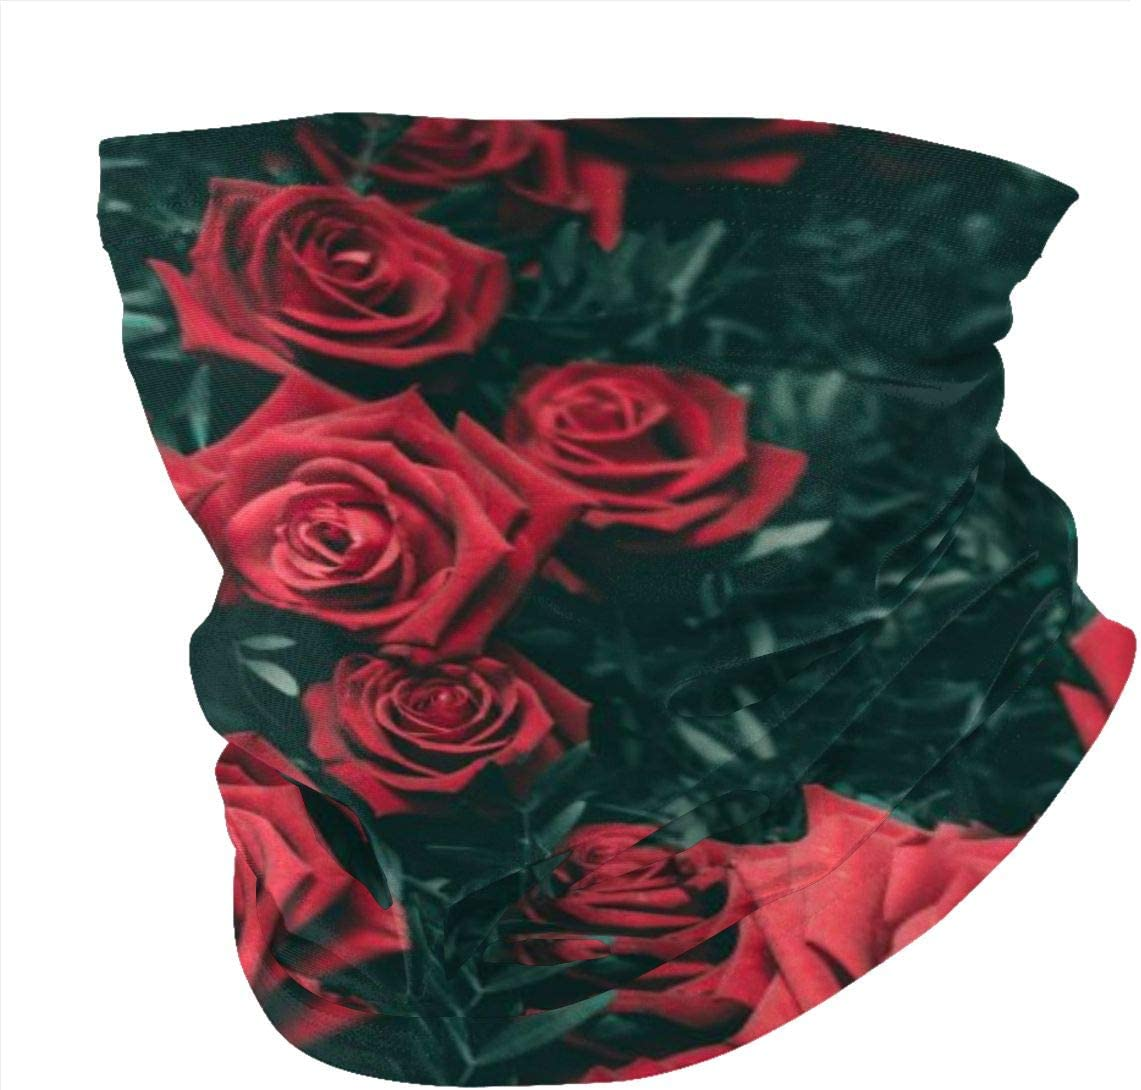 Outdoors Headwear Headwrap Balaclava Tube Mask Multifunctional Headwear Scarf Bandanna Wide Headband NA Bouquet Close up Flowers Leaves Red Roses Bandana